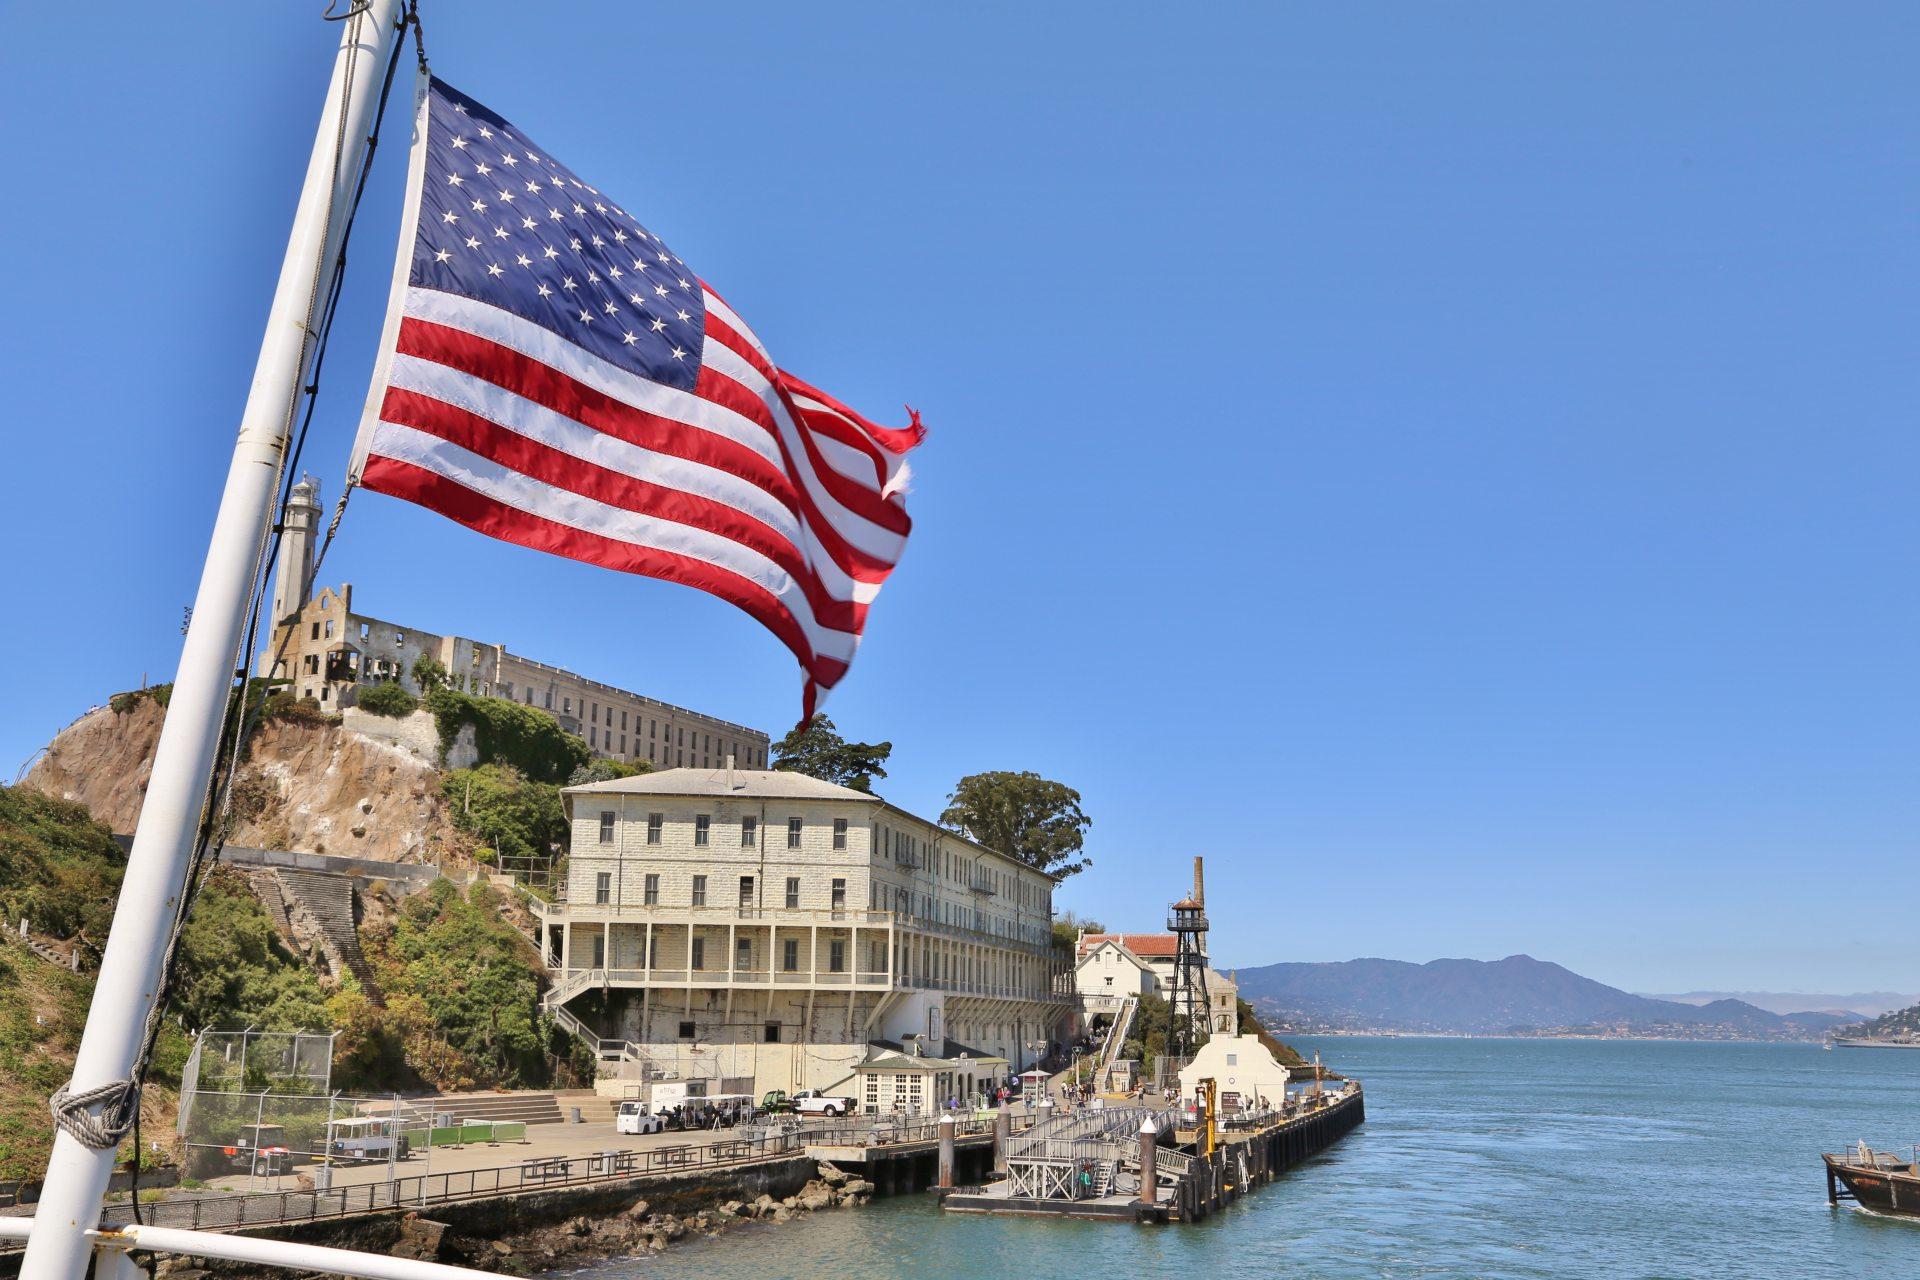 Alcatraz - The American Way of Prison - Alcatraz, Amerikanische Fahne, Bau, Fahne, Flagge, Gebäude, Gefängnis, Gefängnisinsel, Häfen, Haftanstalt, Himmel, Justizvollzugsanstalt, JVA, Kalifornien, Meer, San Francisco, Strafanstalt, Wasser - (Alcatraz, San Francisco, California, Vereinigte Staaten)